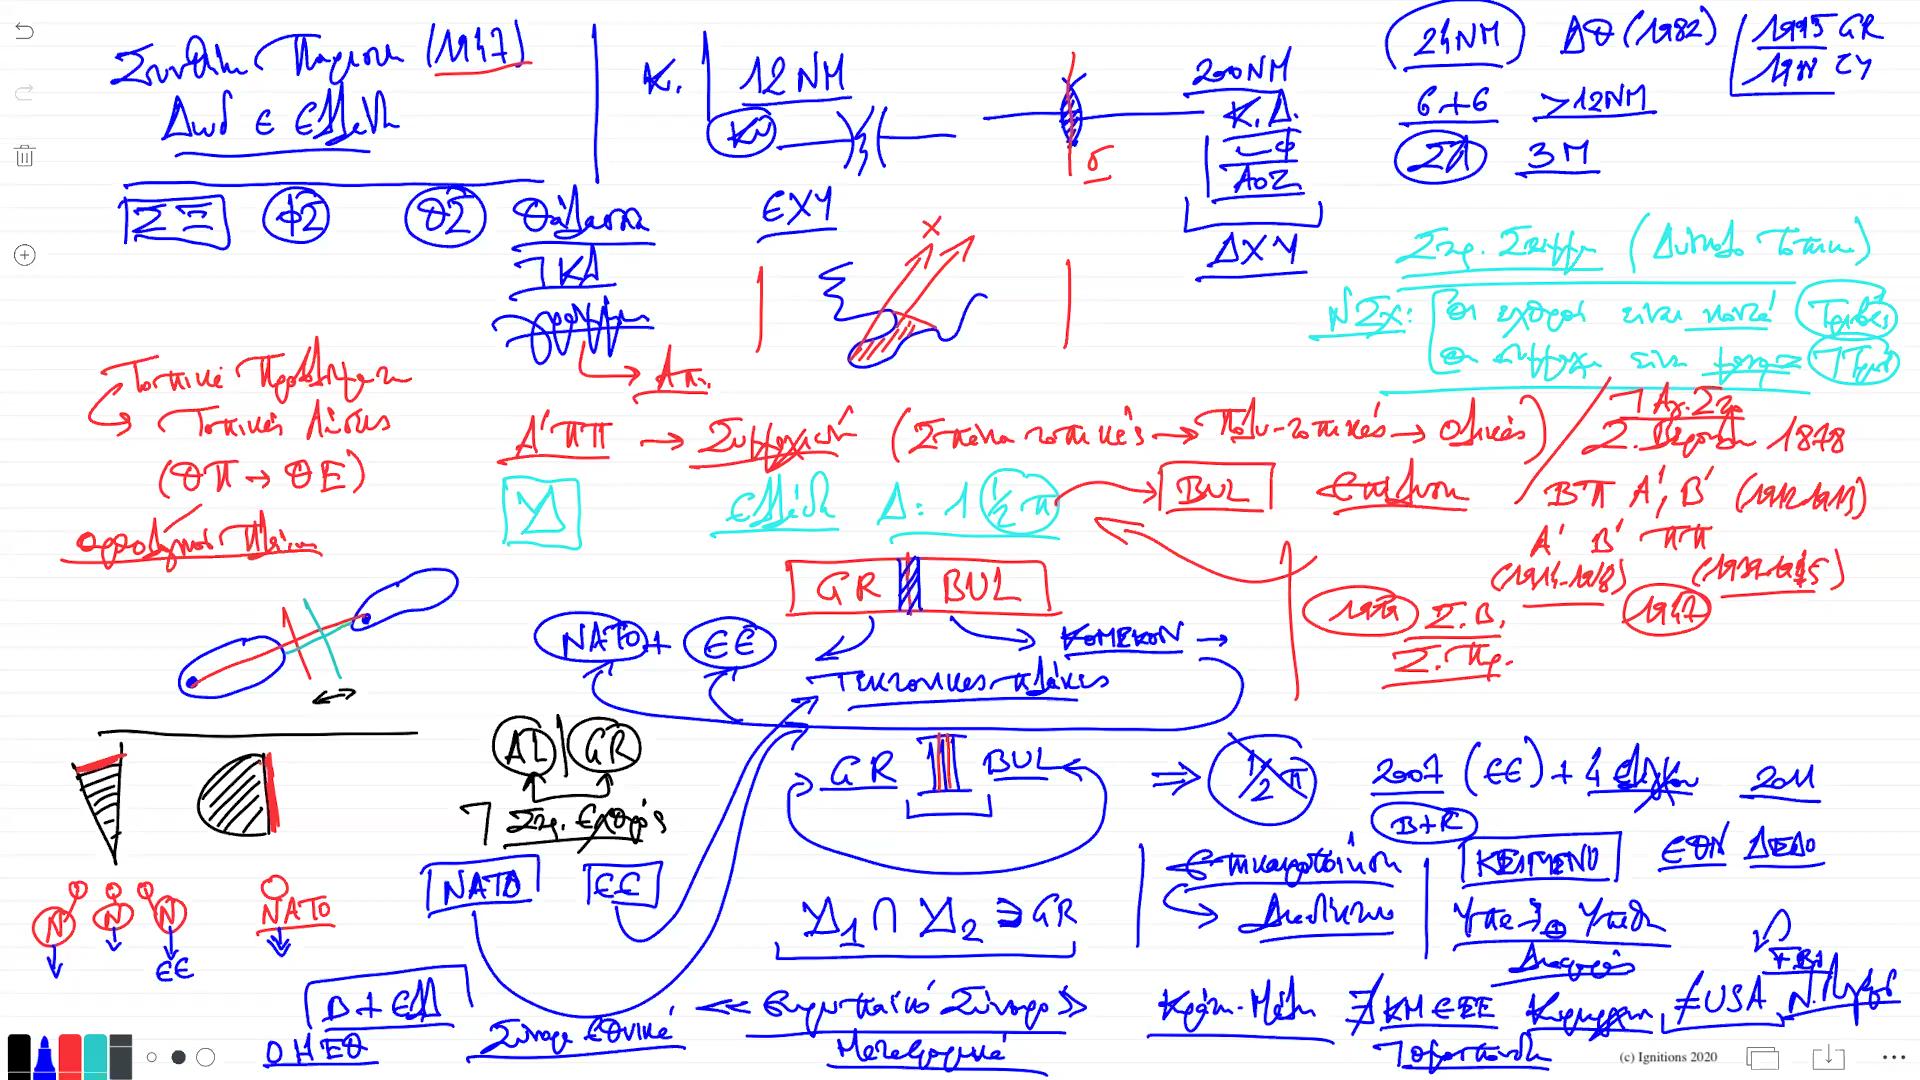 56461 - VI - e-Διάλεξη: Ελληνική Γεωστρατηγική II. (Dessin)